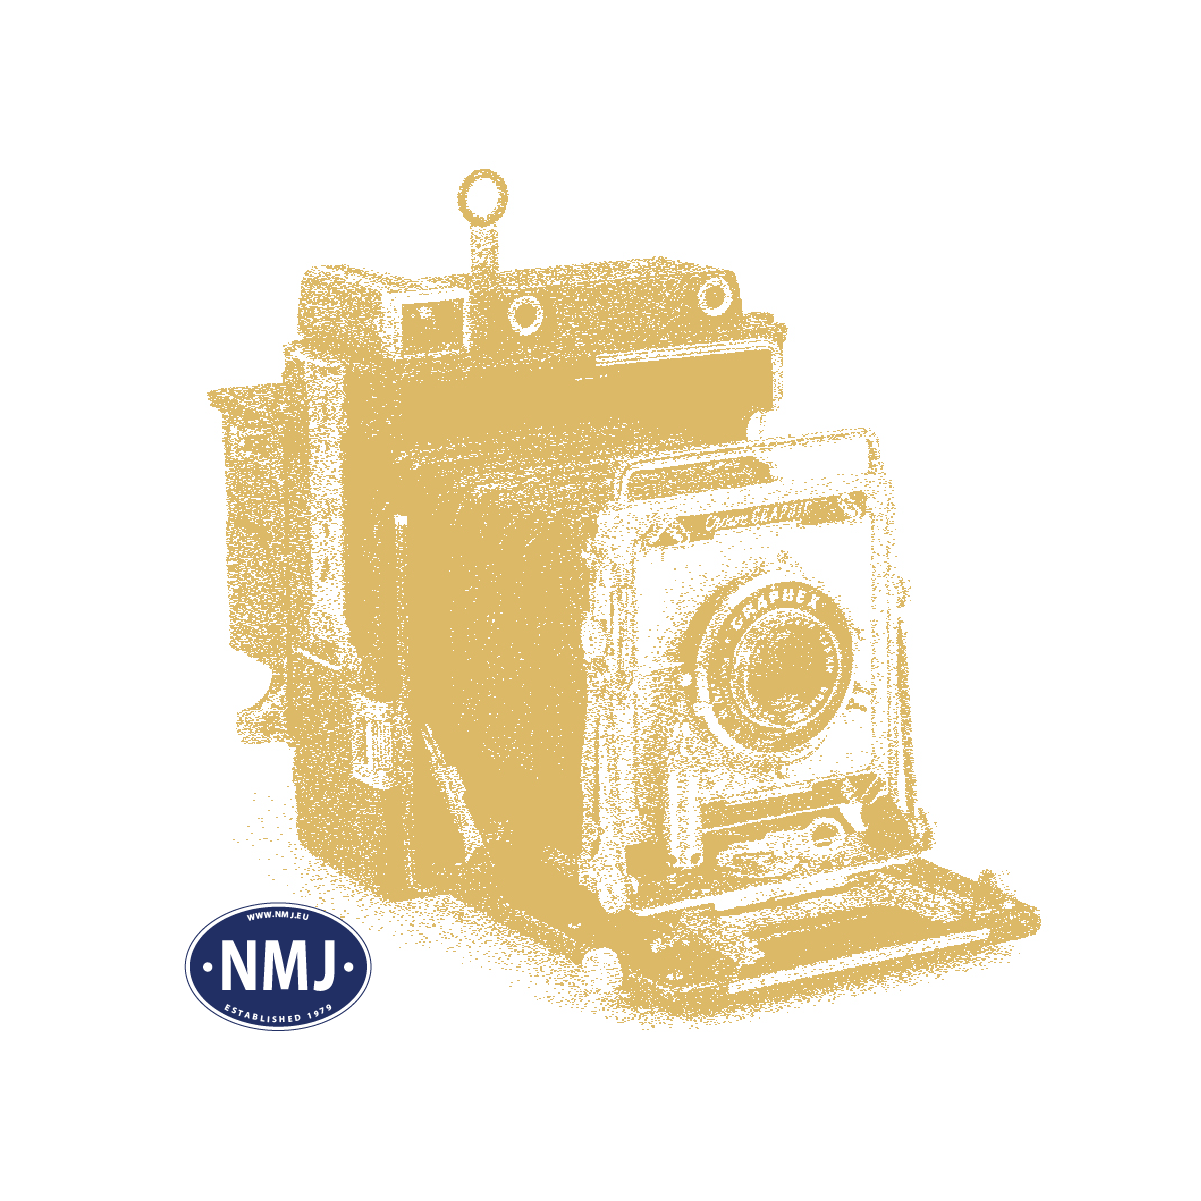 NMJT90603 - NMJ Topline Strabag TMY 1147, DCC Sound